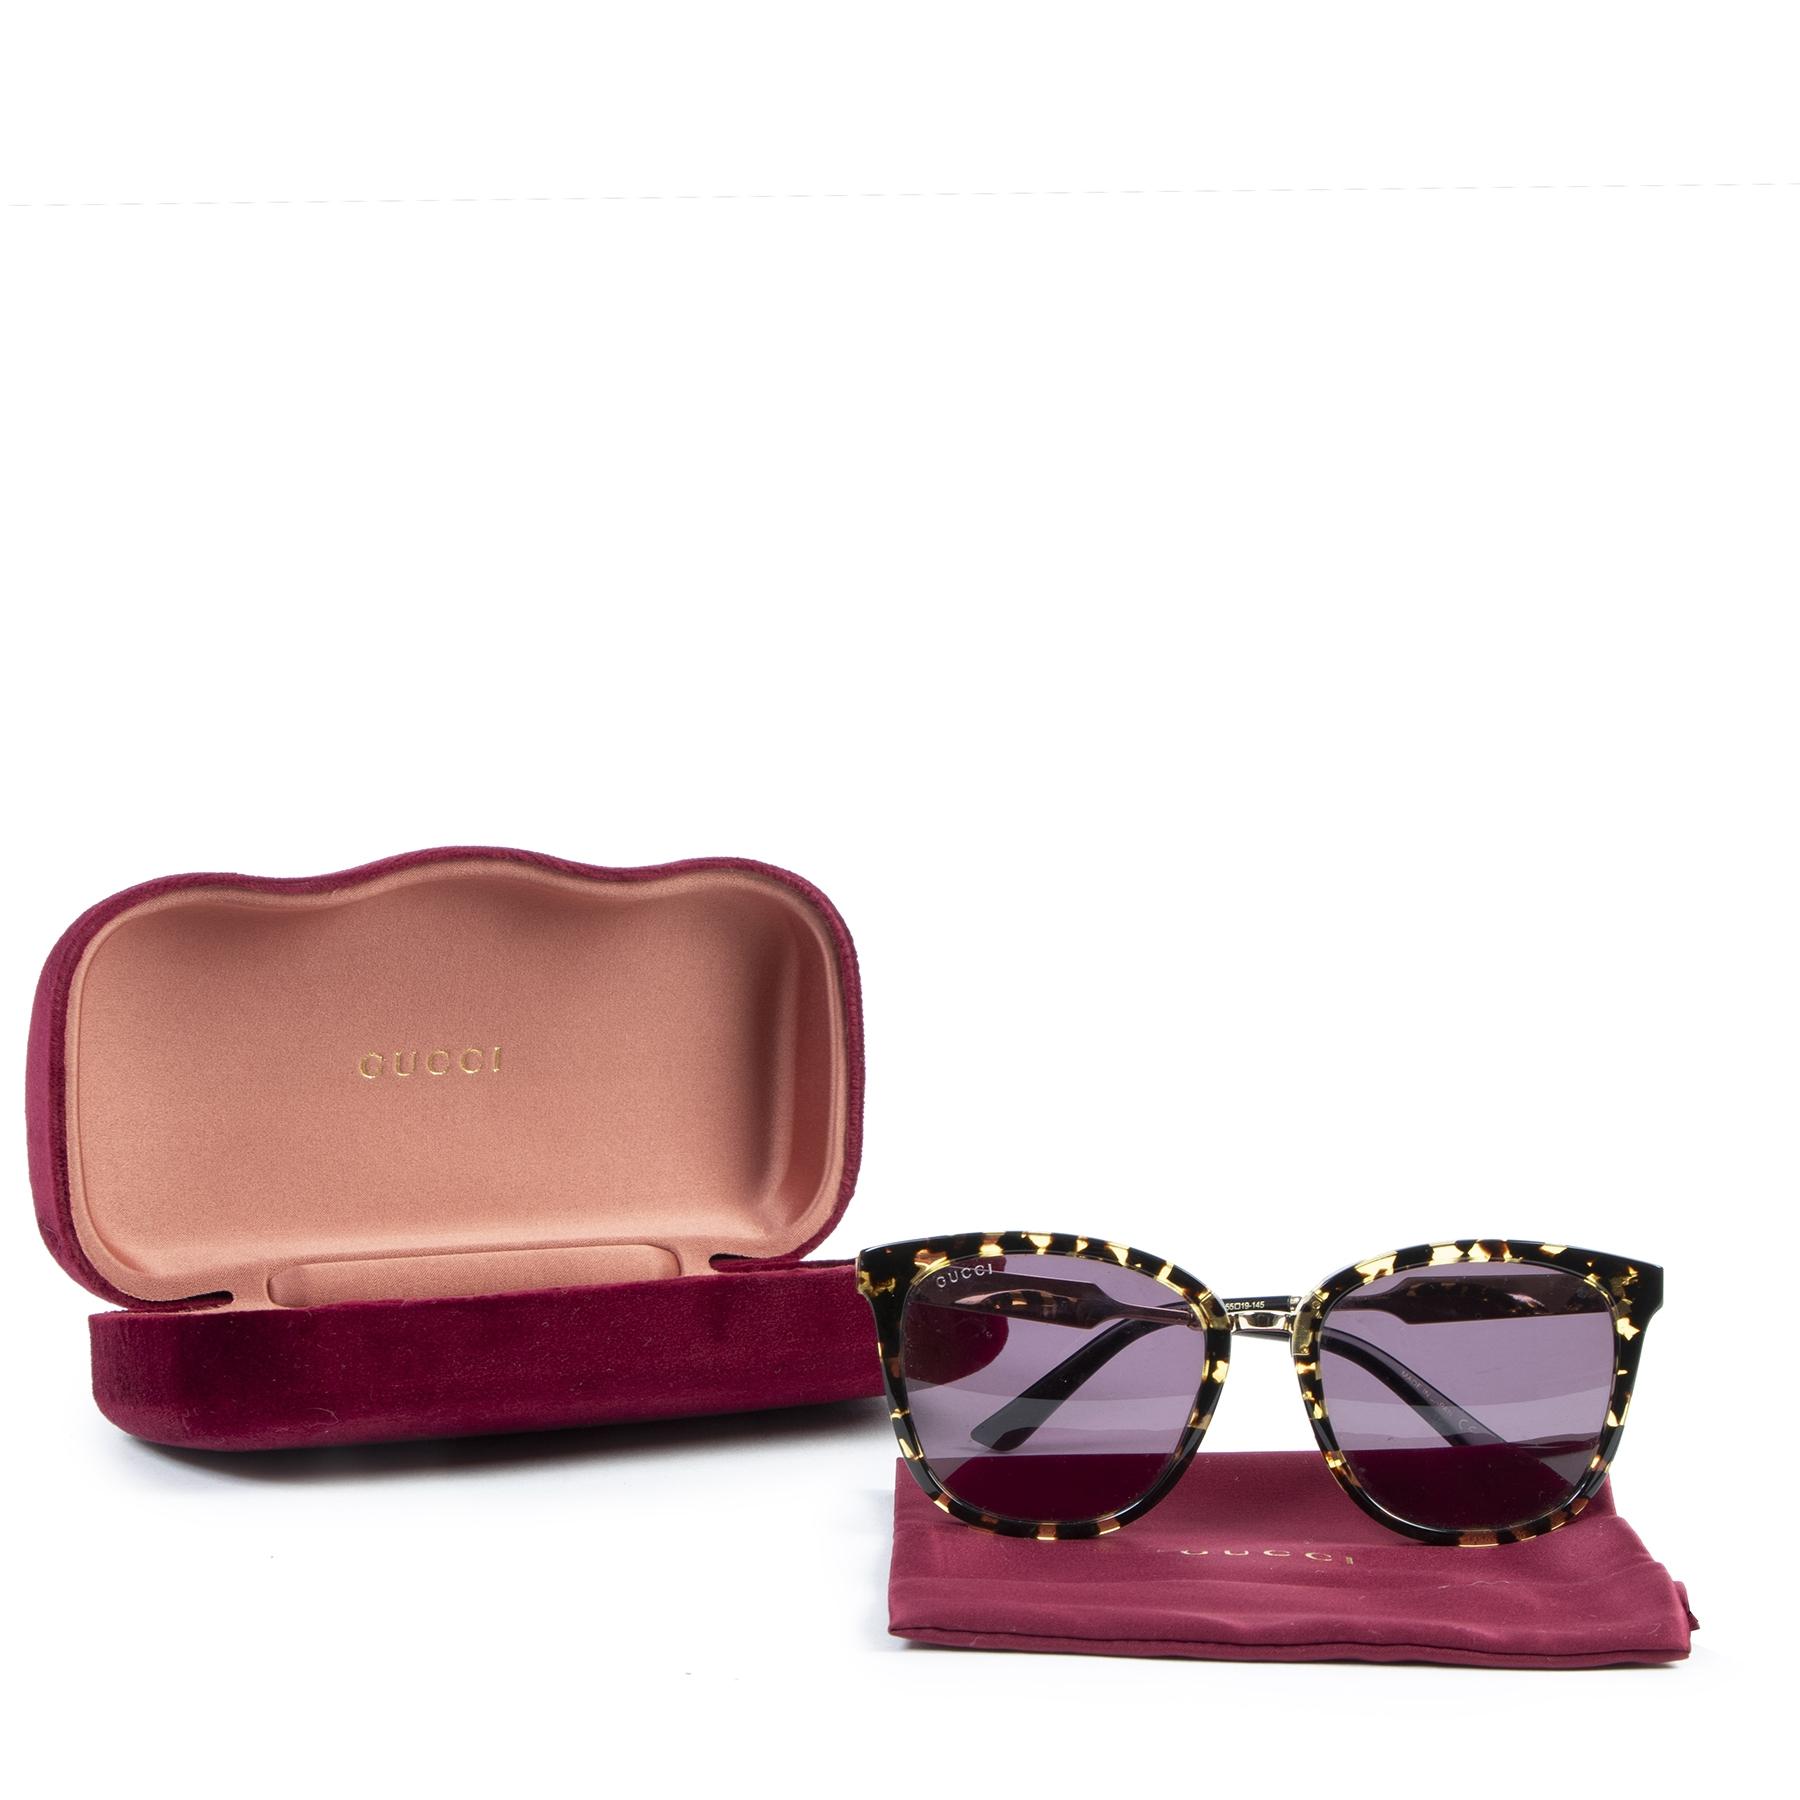 koop online Gucci Tortoise Sunglasses